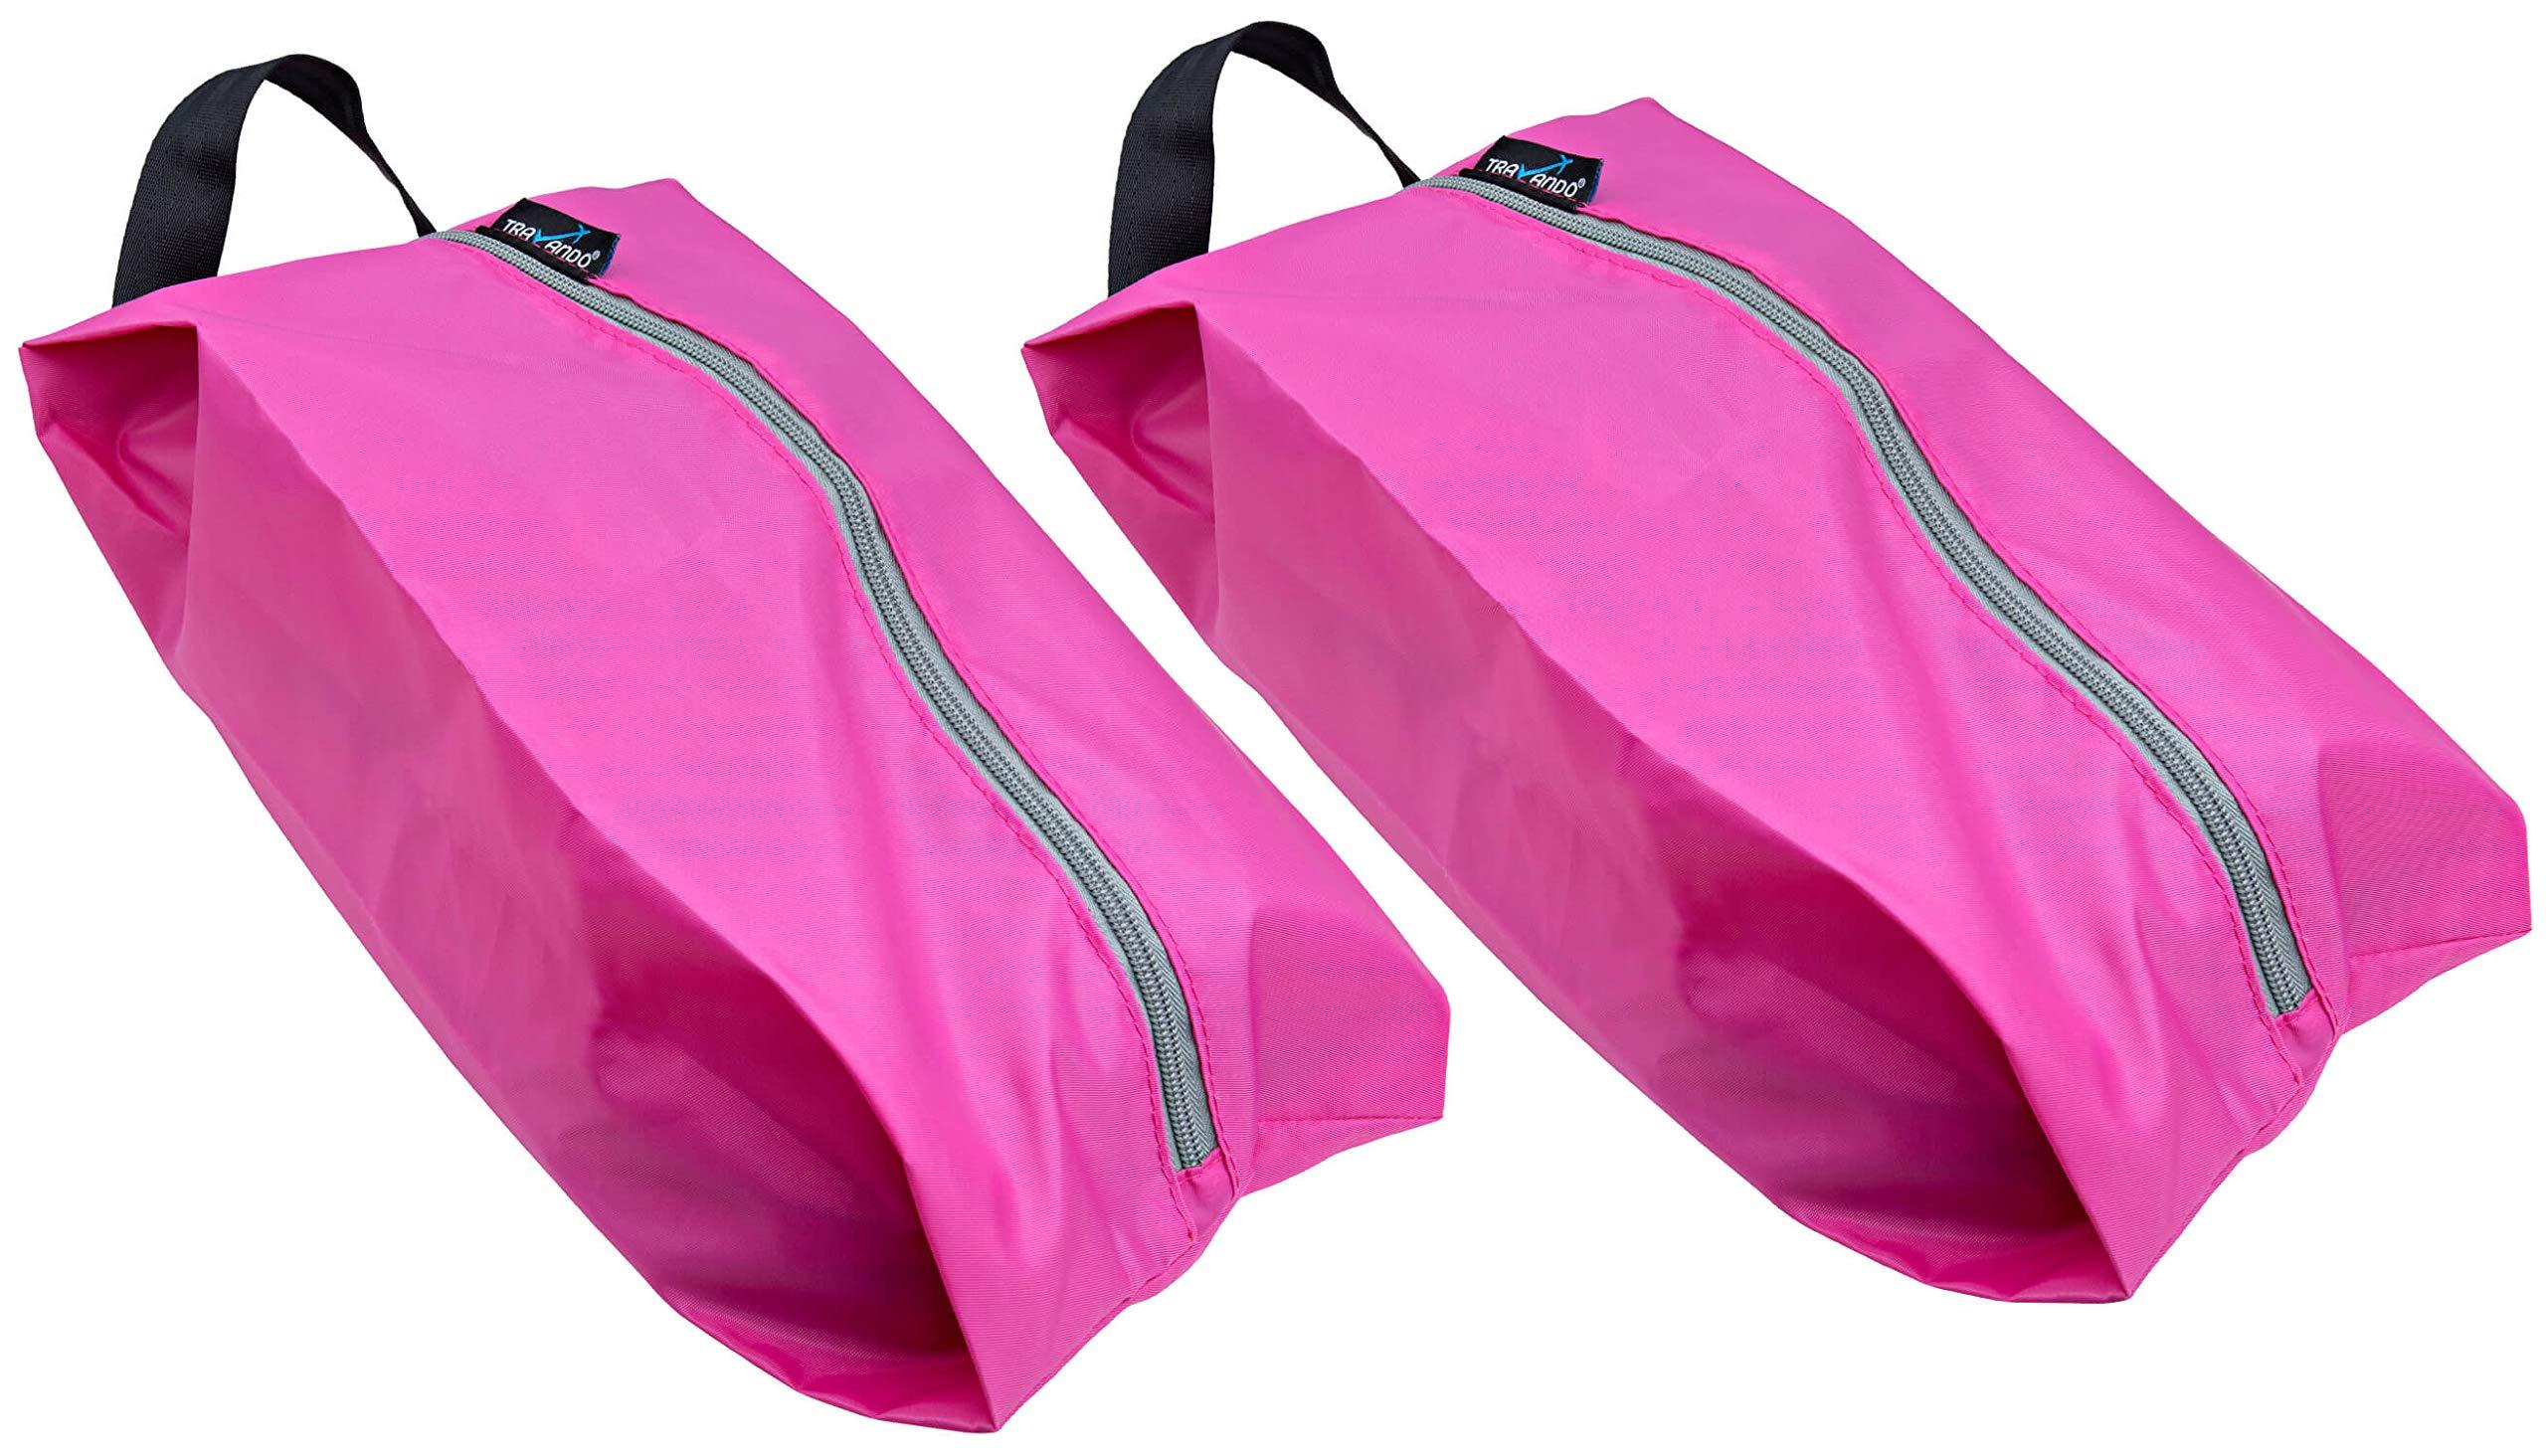 21fe9dd72ee8 Galleon - TRAVANDO Shoe Bag Set Of 2 | Travel Accessories Essentials ...